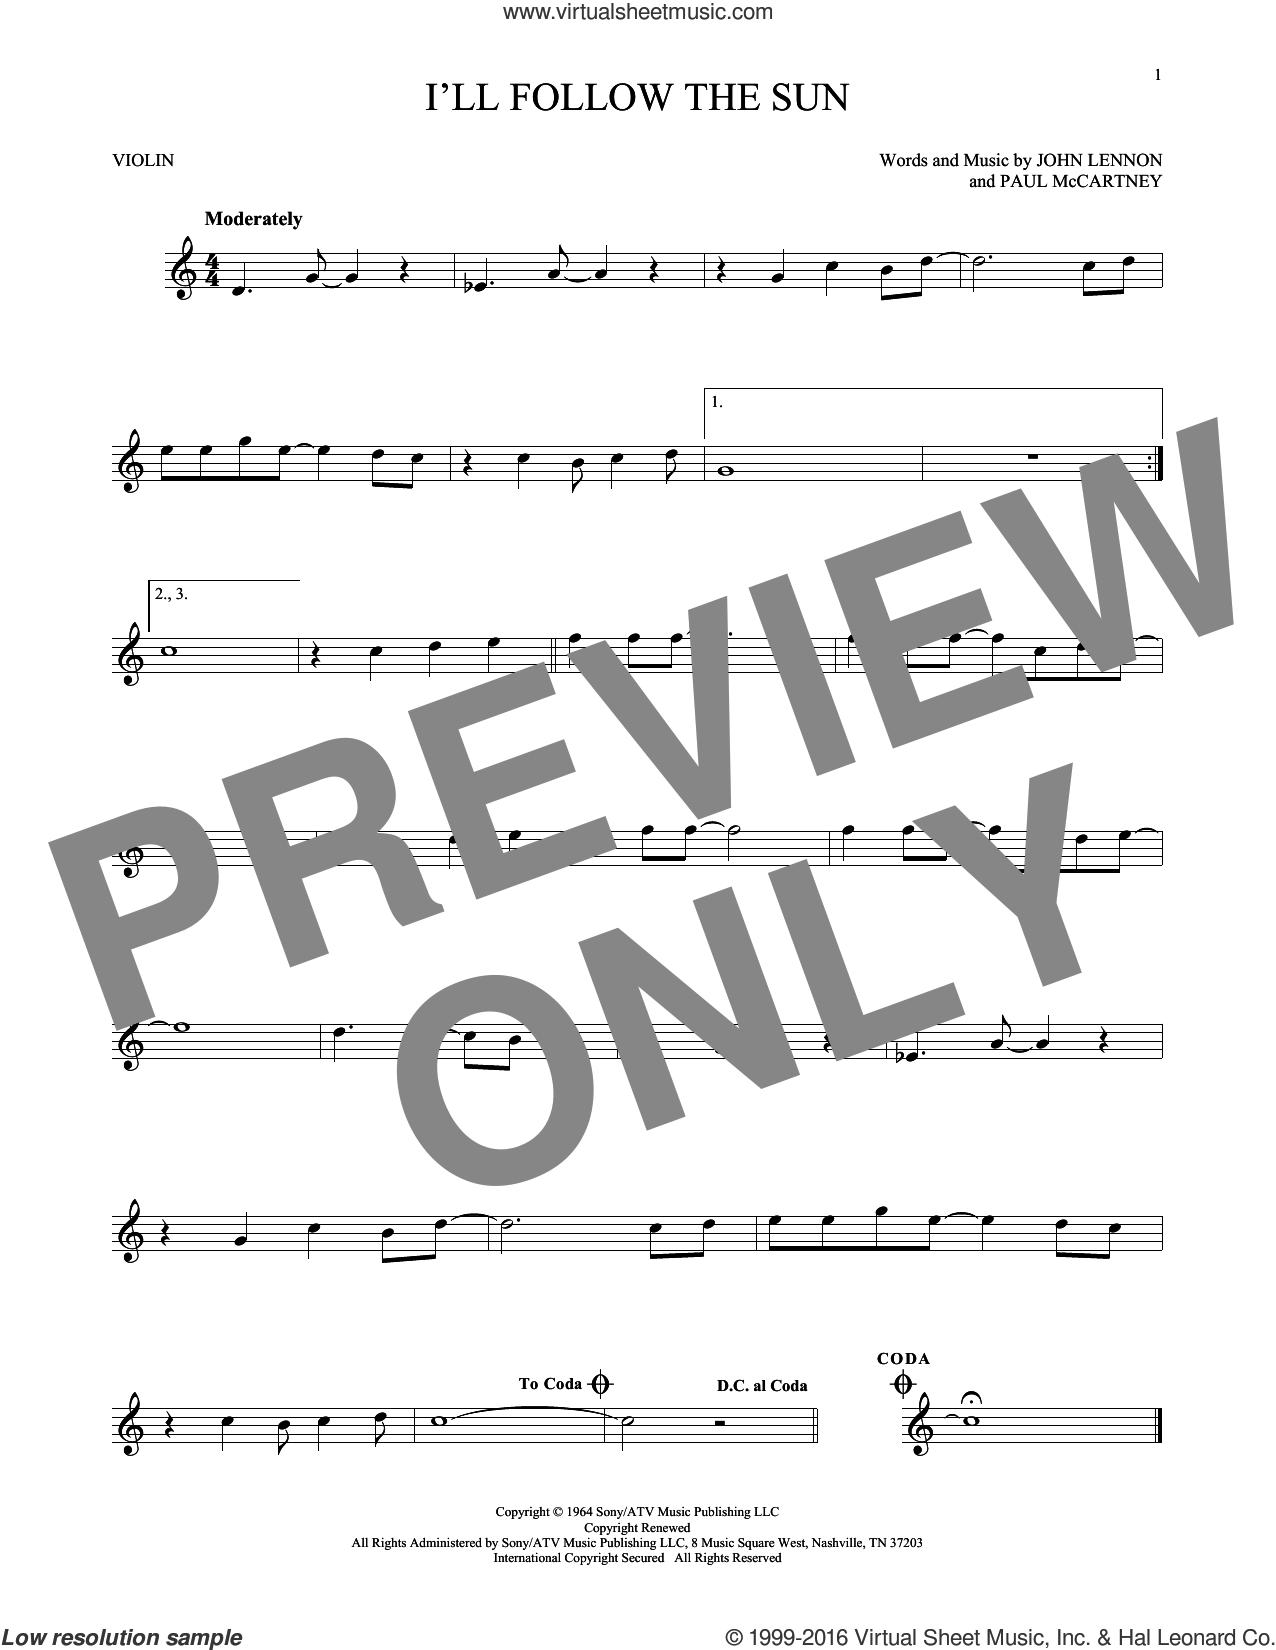 I'll Follow The Sun sheet music for violin solo by The Beatles, John Lennon and Paul McCartney, intermediate skill level